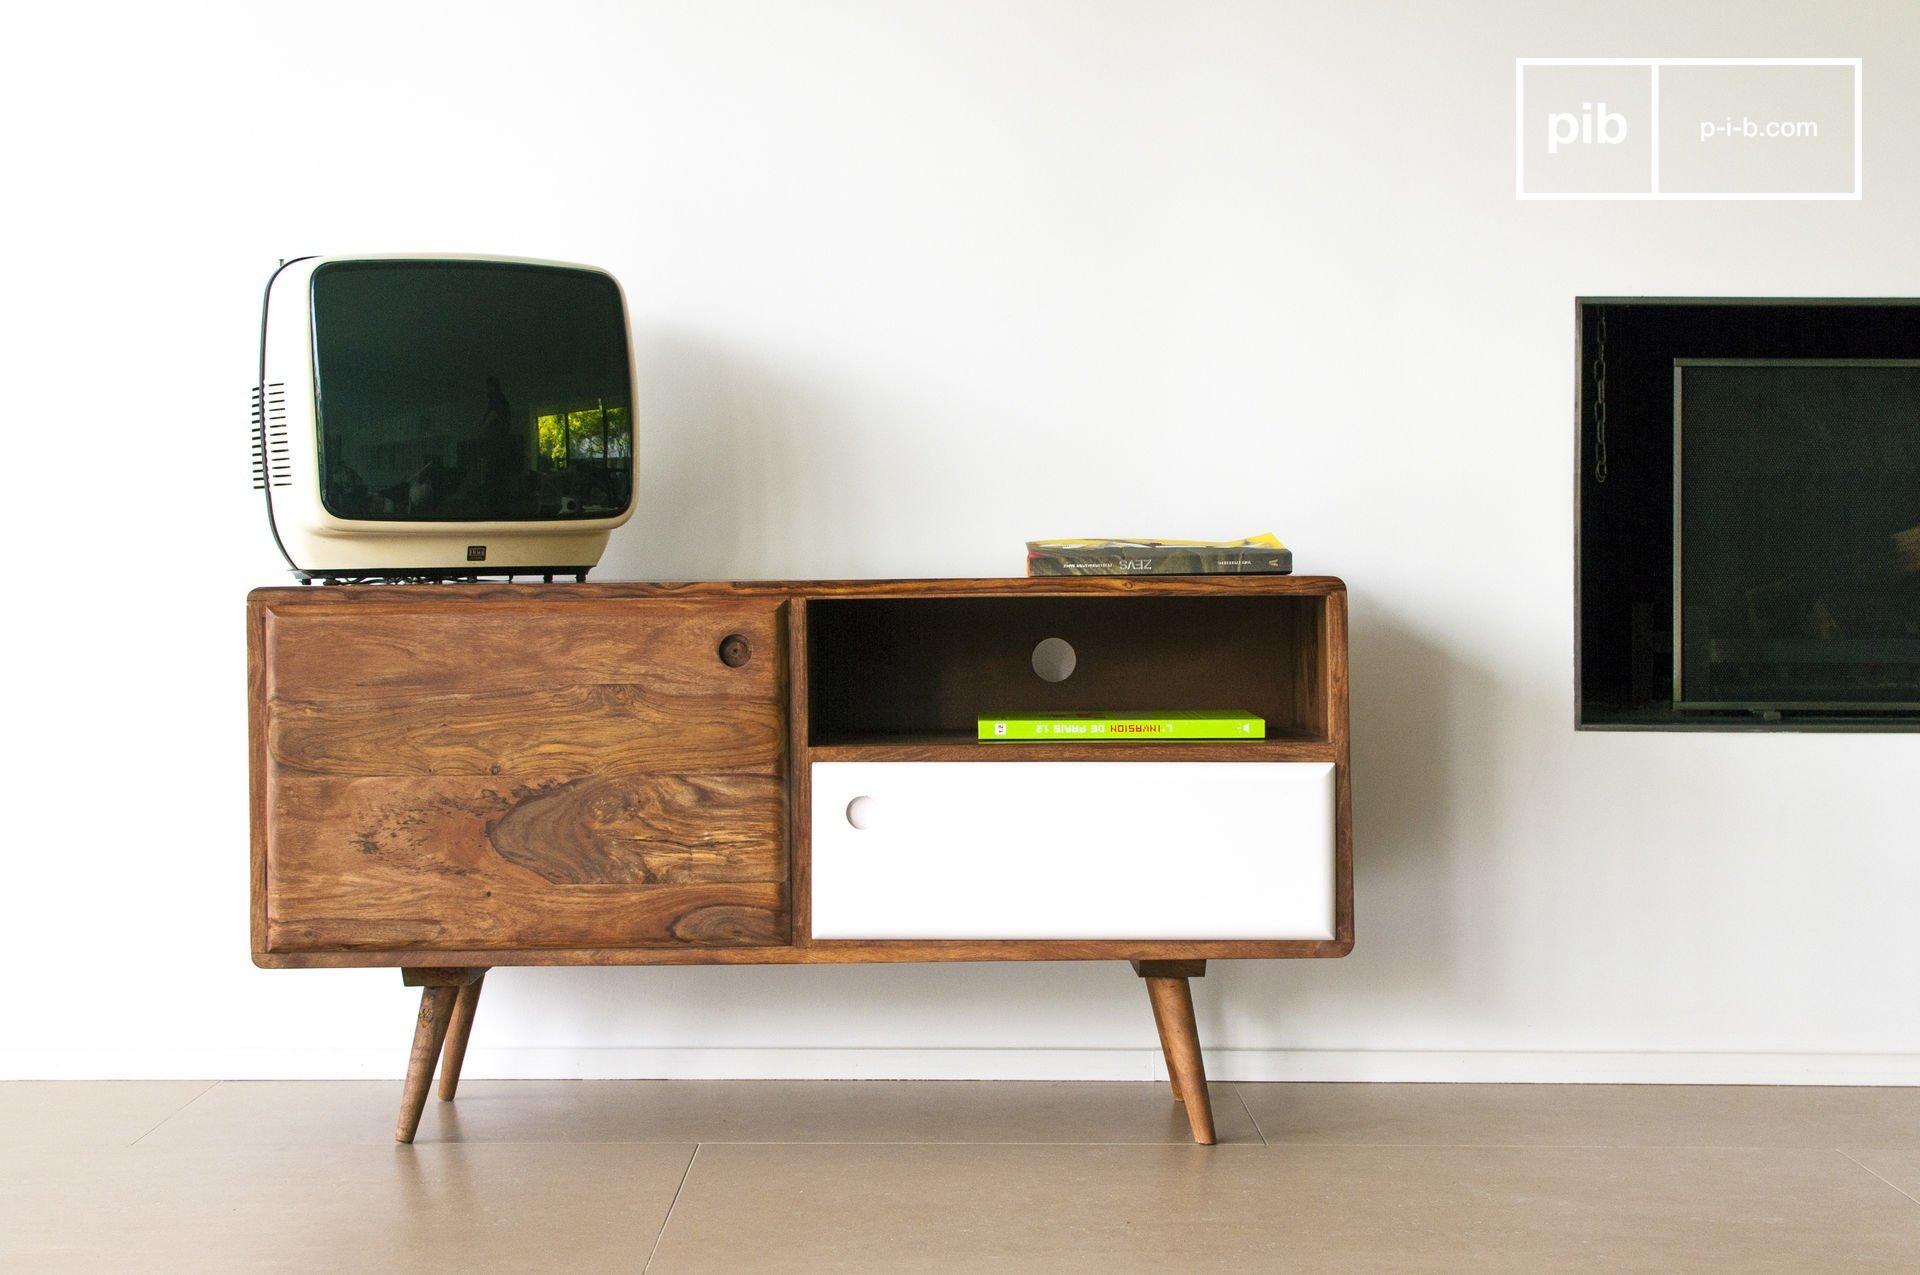 meuble-tv-scandinave-1969-114918_1920